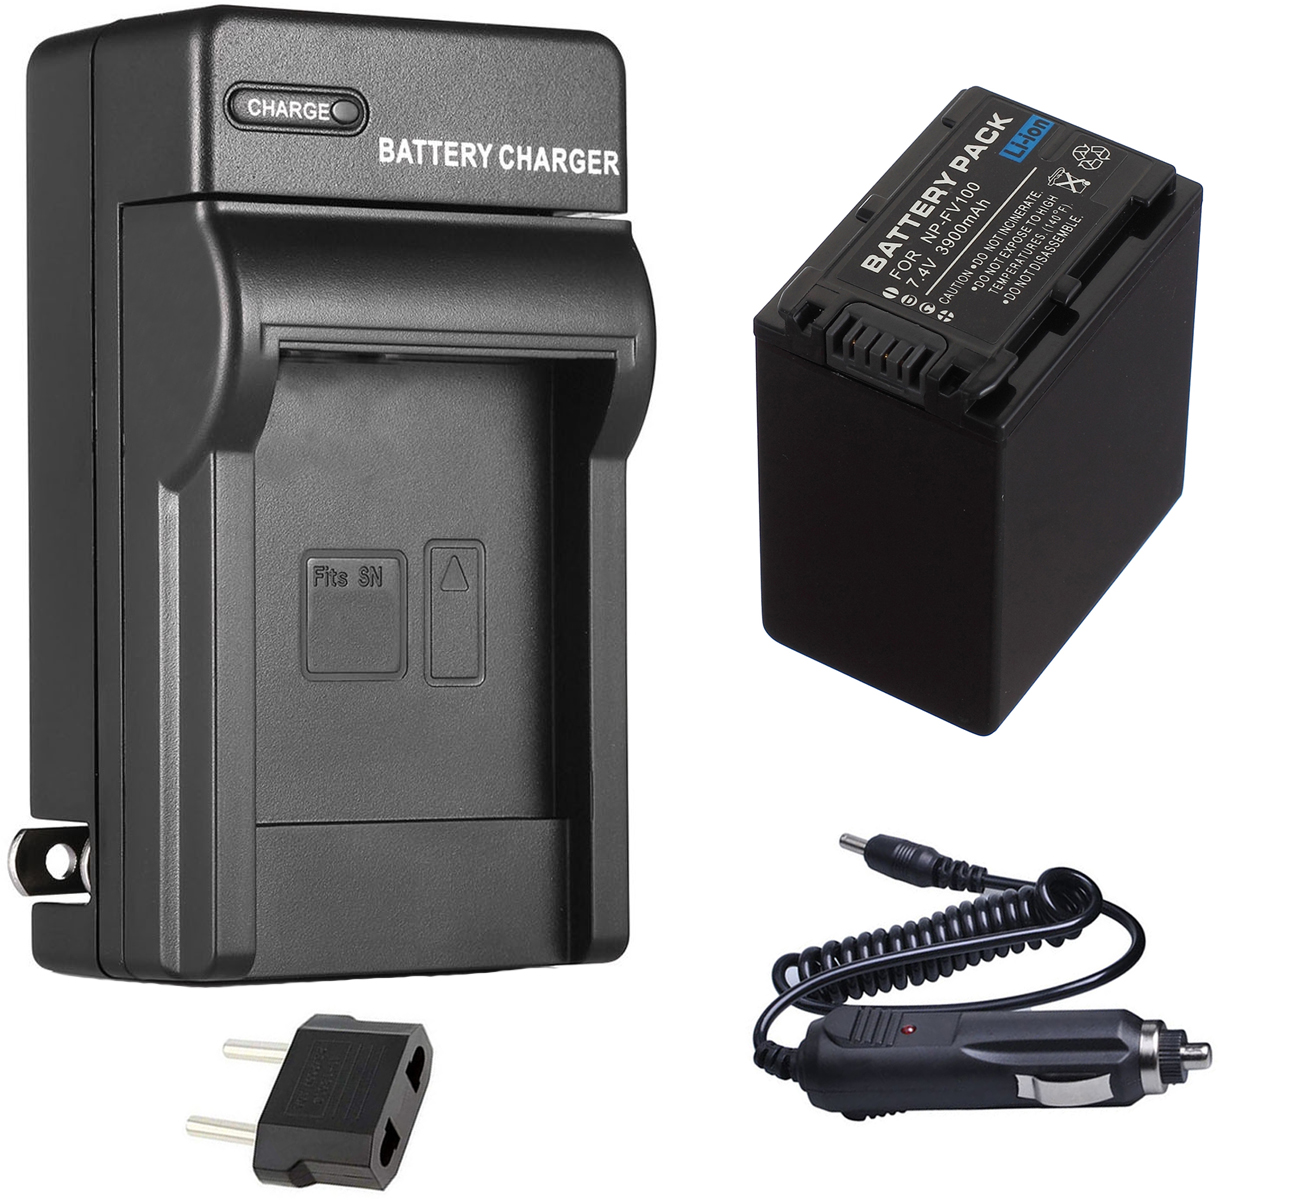 HDR-CX485E Handycam Camcorder Micro USB Battery Charger for Sony HDR-CX450E DR-CX455E HDR-CX480E